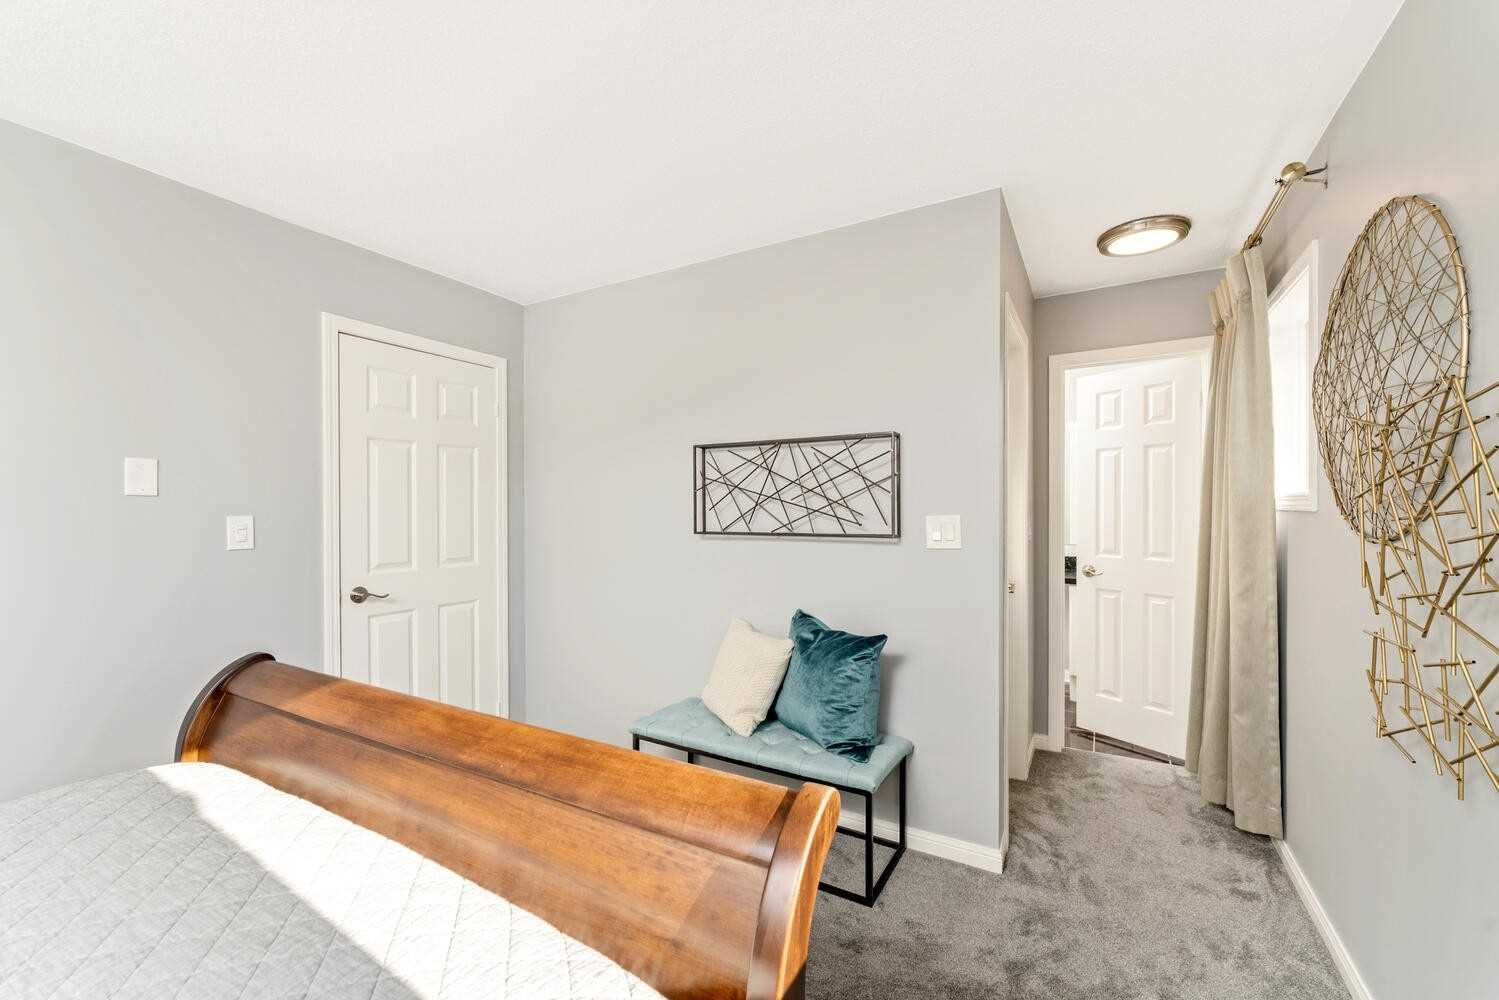 1030 Barclay Circ - Beaty Att/Row/Twnhouse for sale, 3 Bedrooms (W5400435) - #16